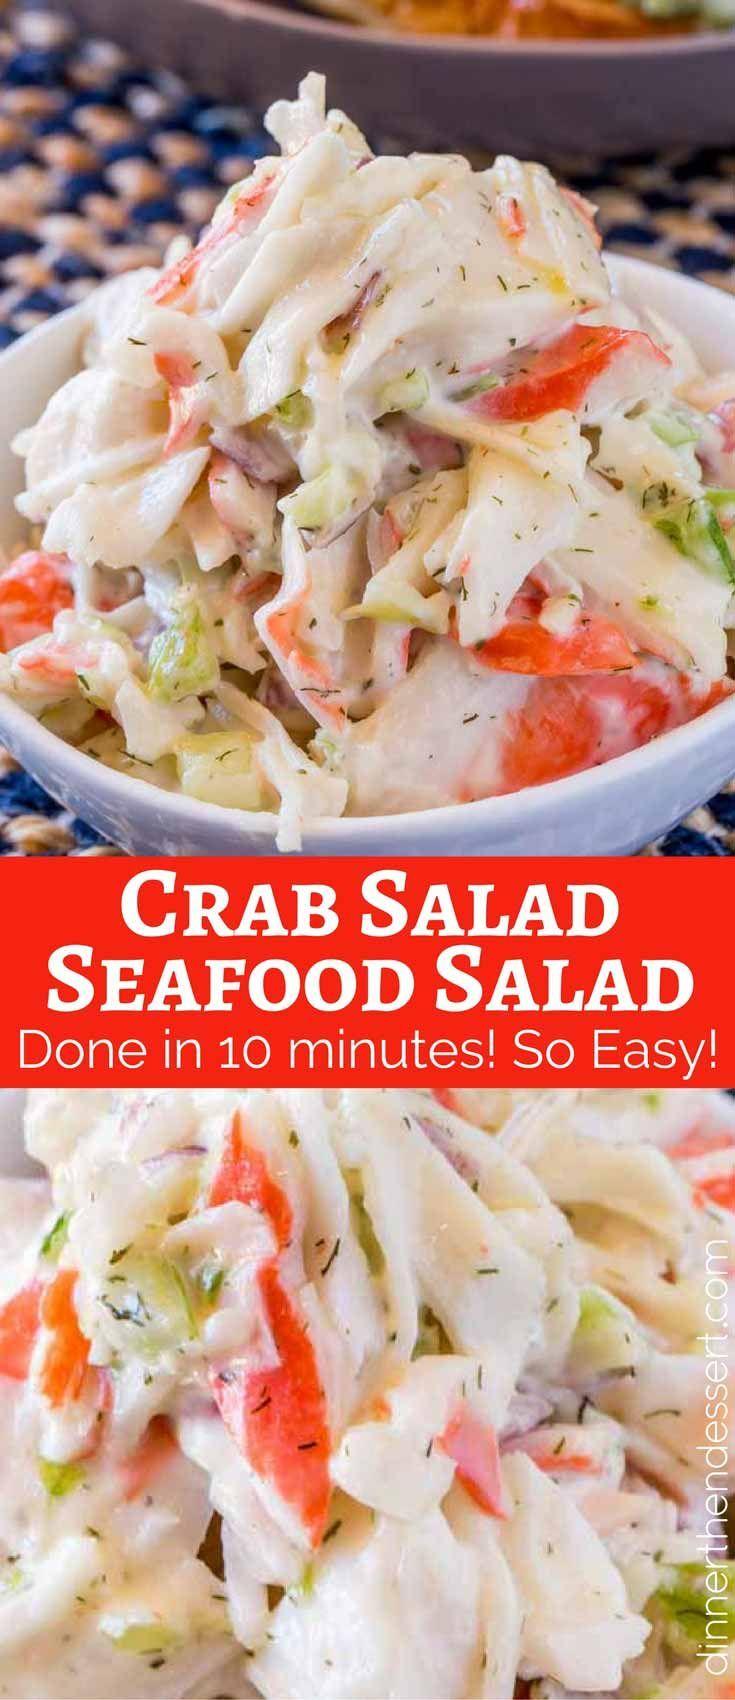 20-Minute Dinner: Asian Crab Salad